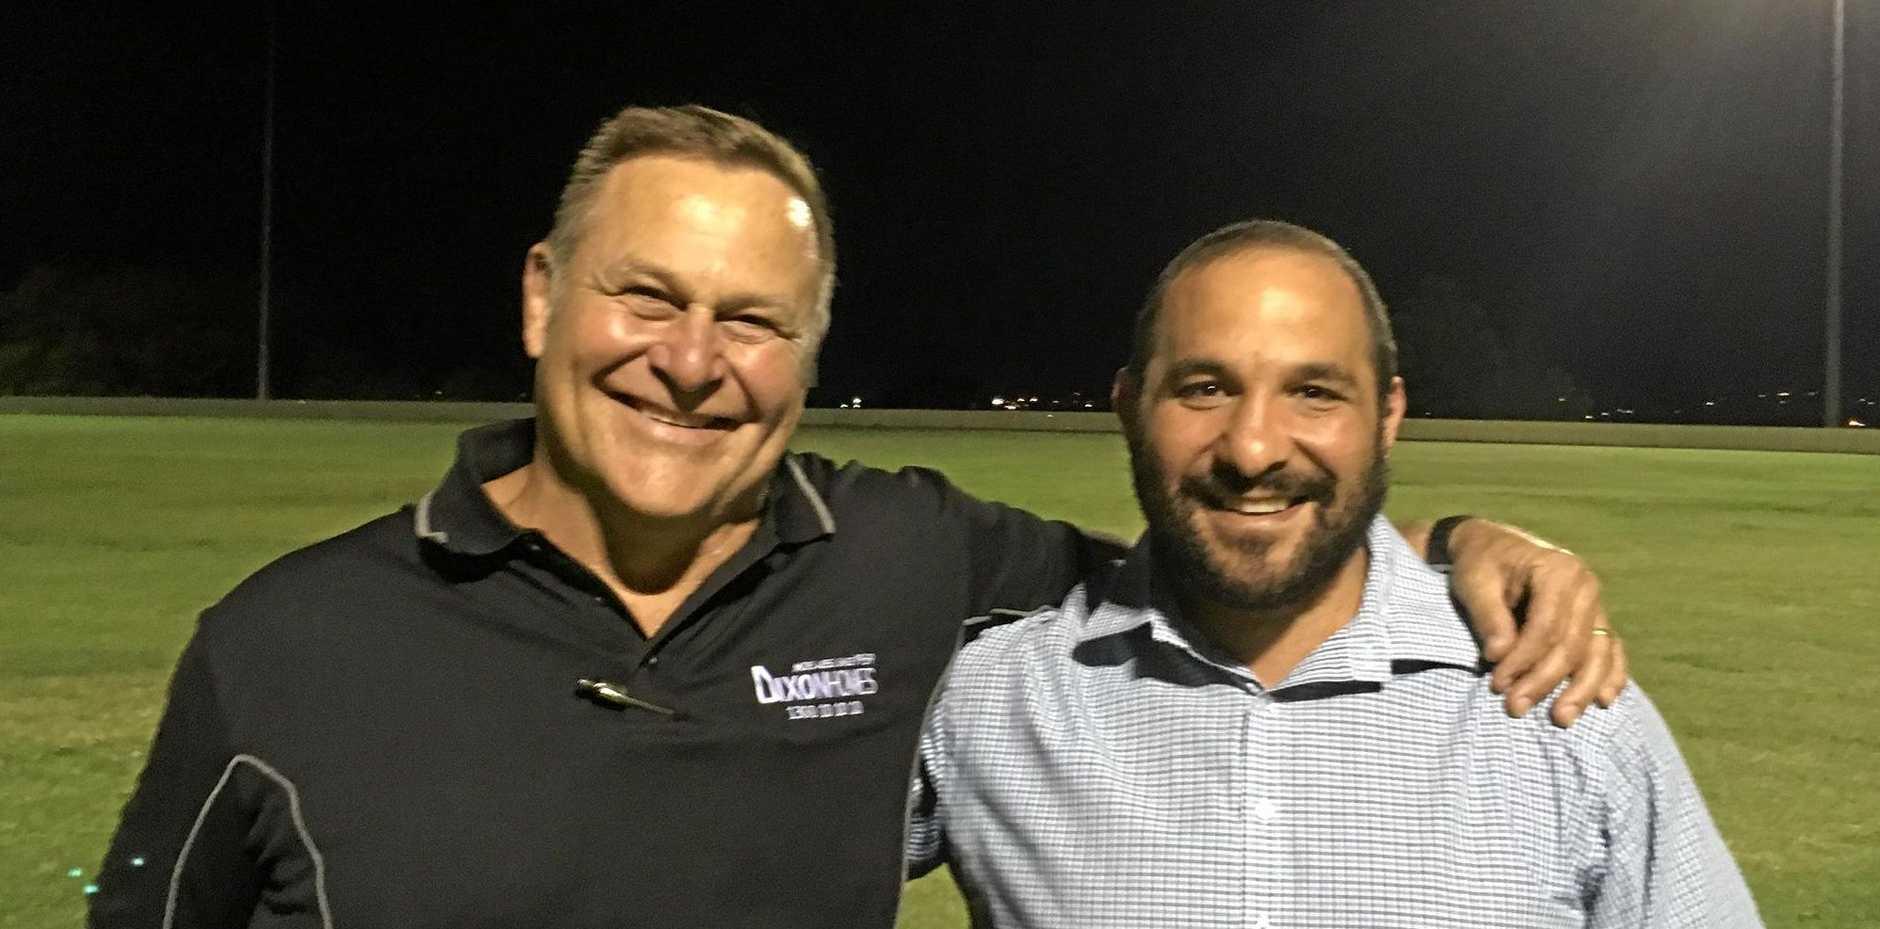 2019 Toowoomba Bears coaching team Bryan Battersby (left) and Mick Jarroush.